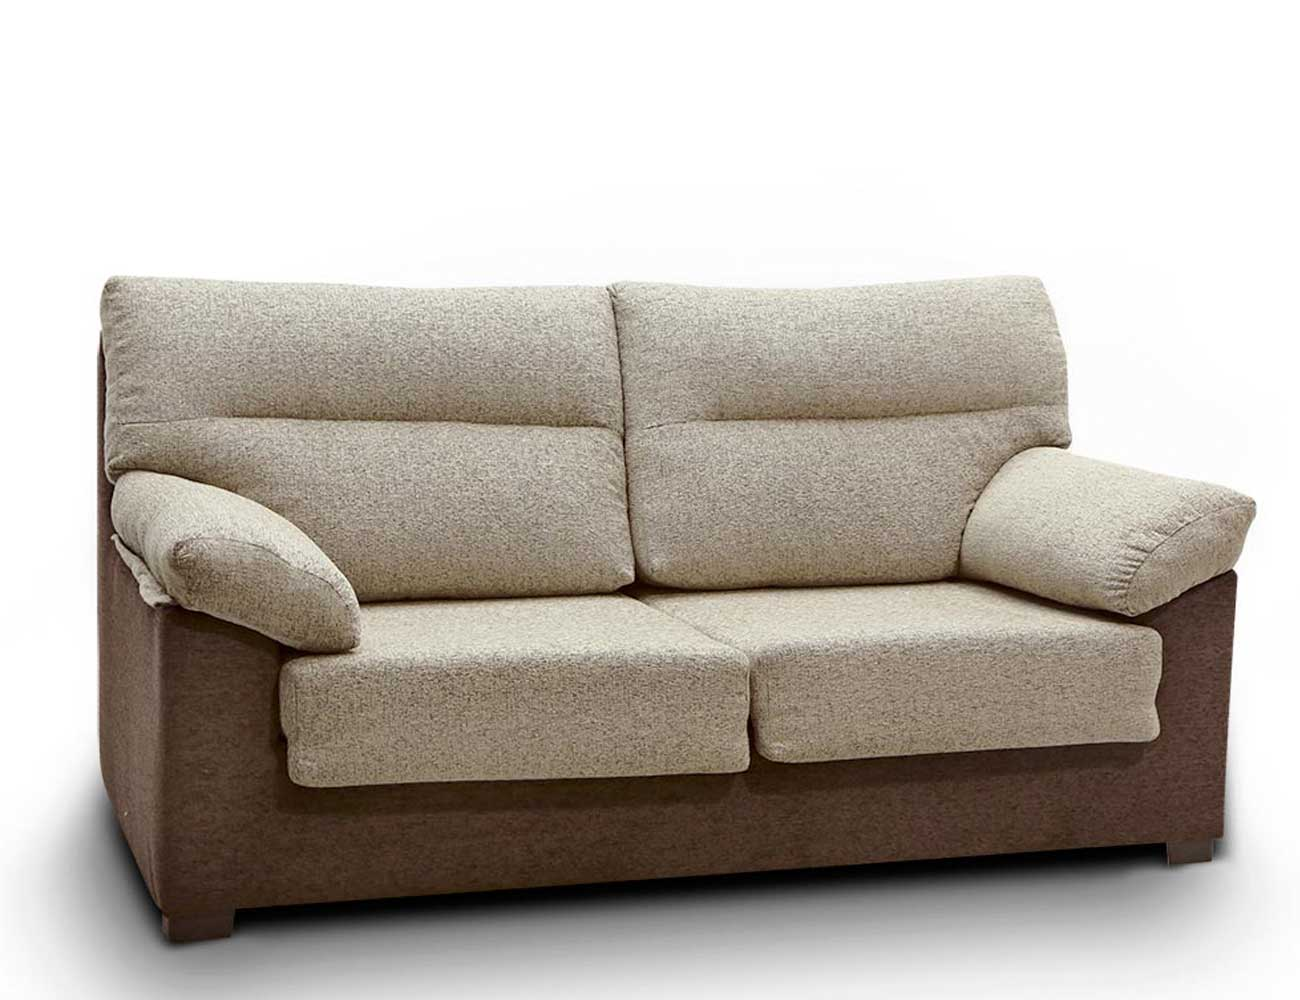 Sofa 3 plazas barato12